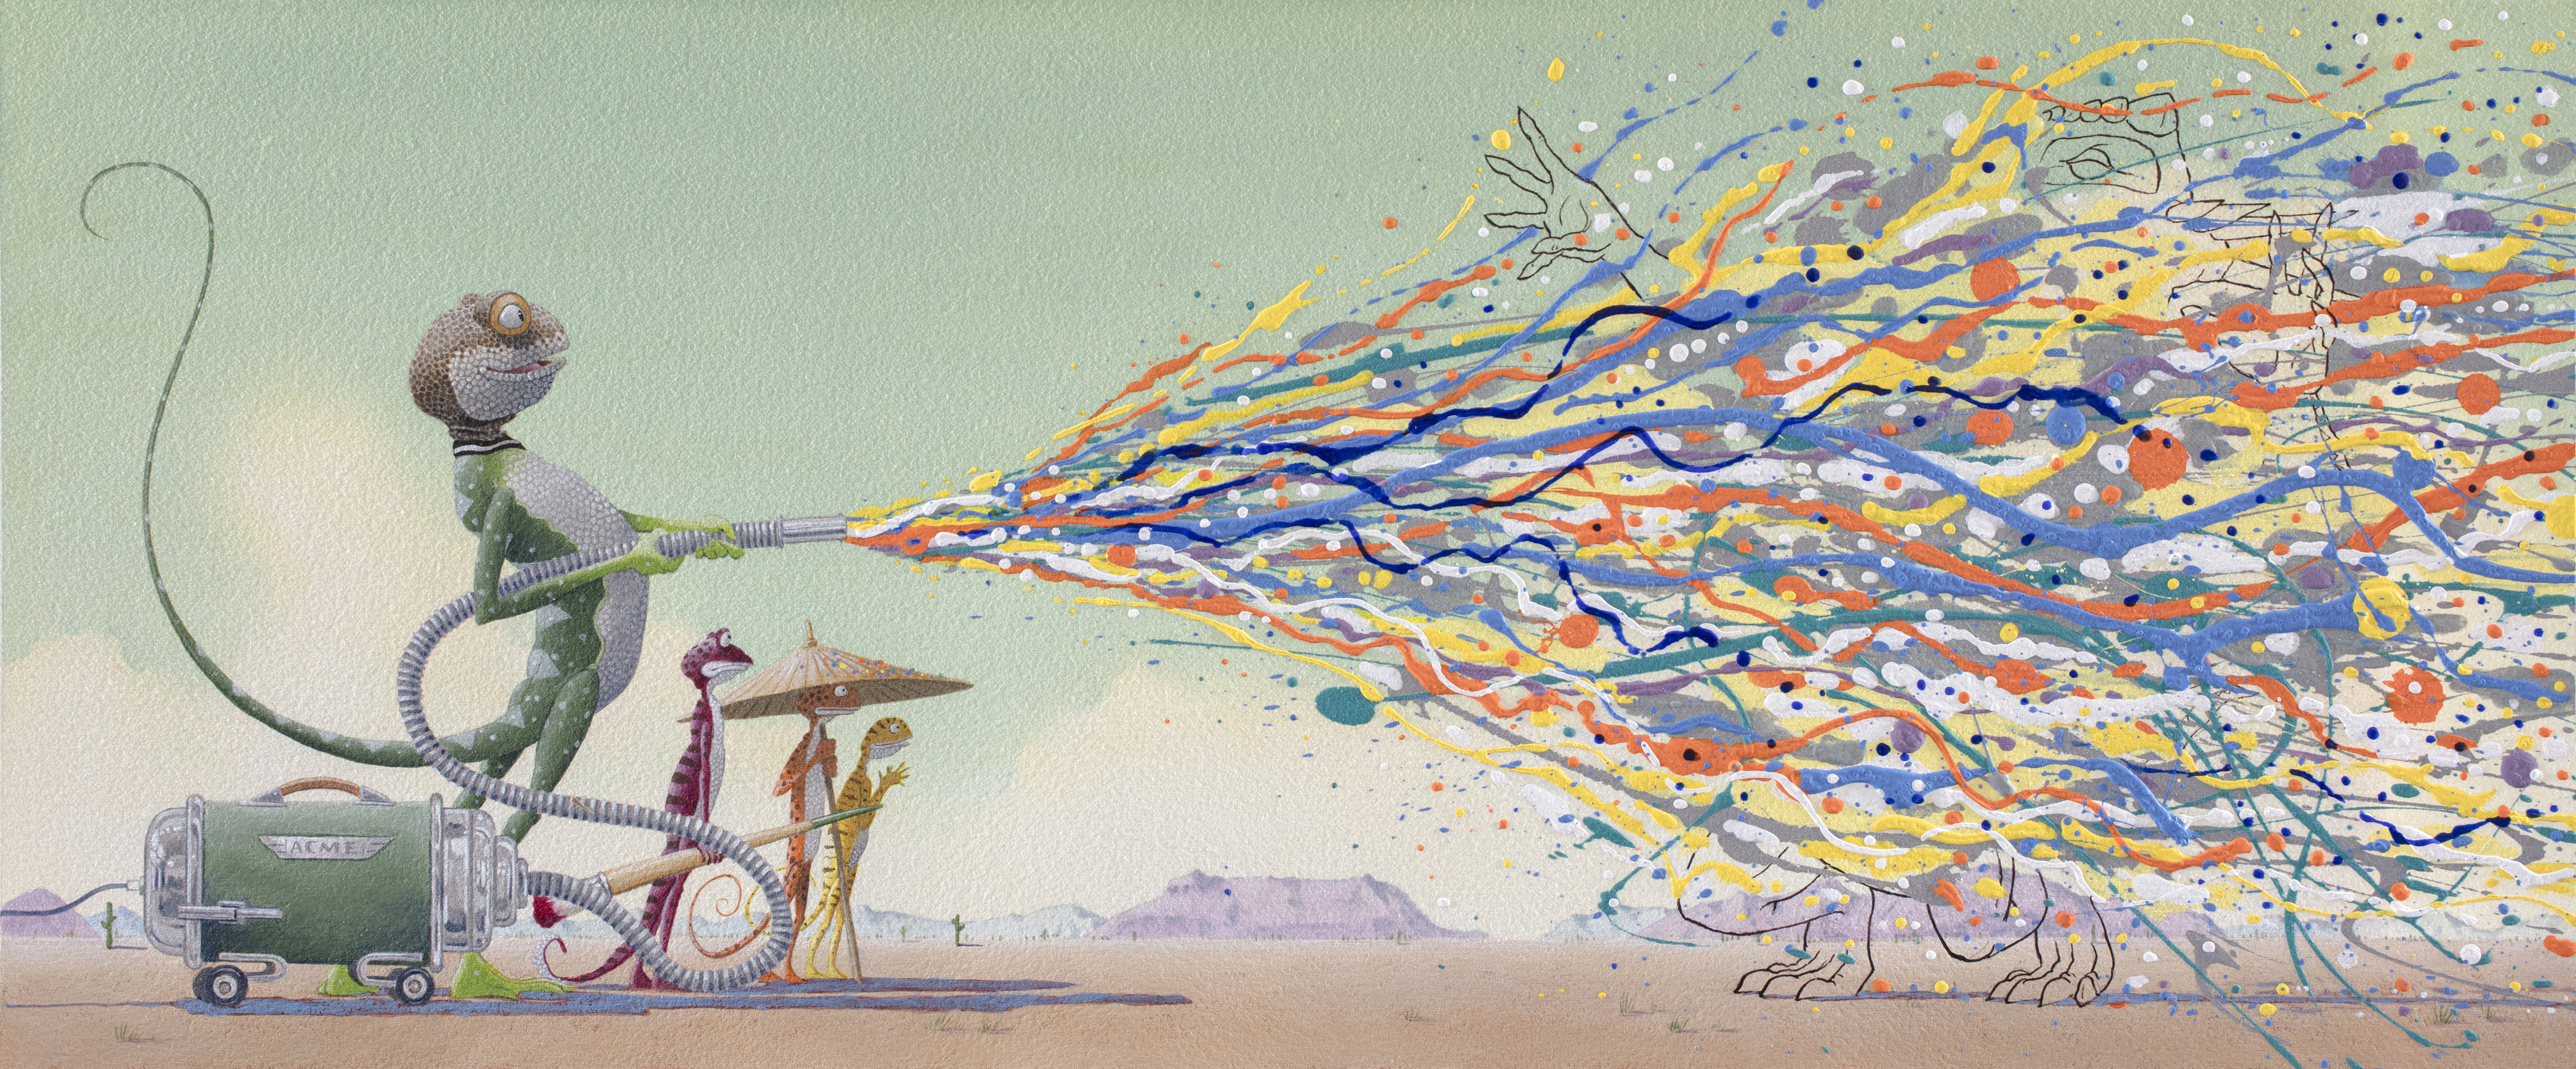 Art & Max 2 15inch